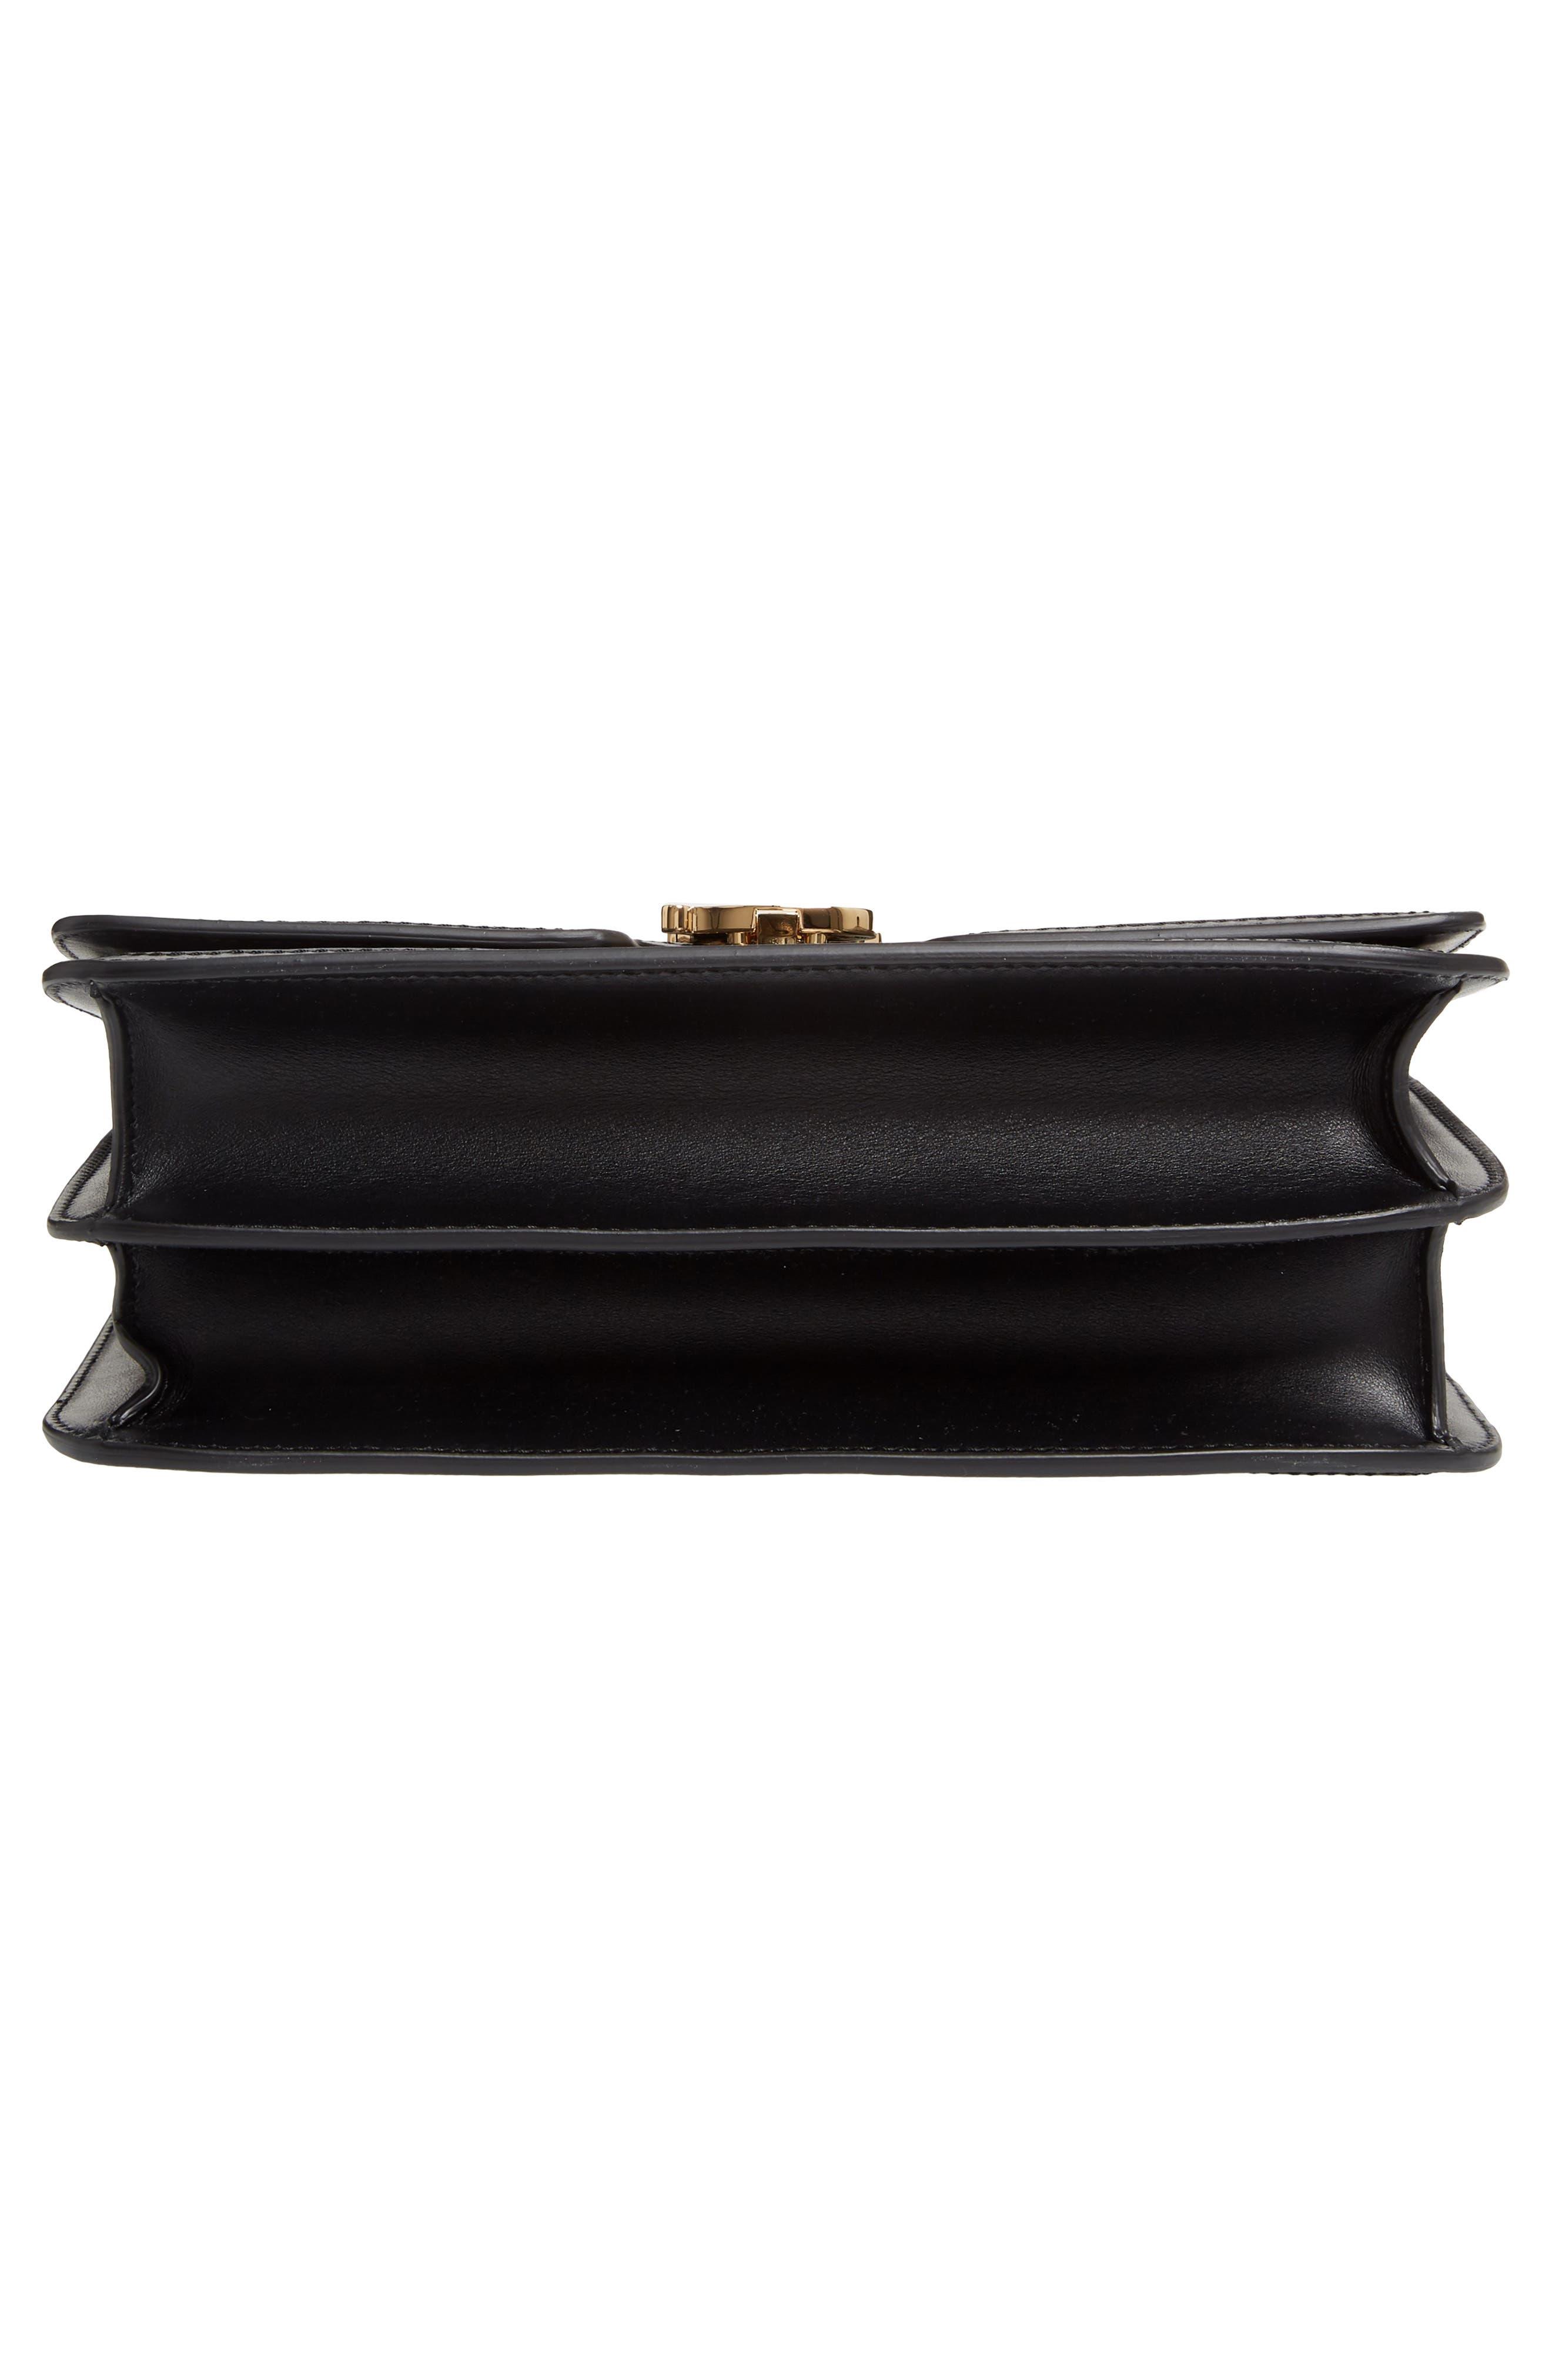 BURBERRY, Medium TB Monogram Leather Bag, Alternate thumbnail 7, color, BLACK